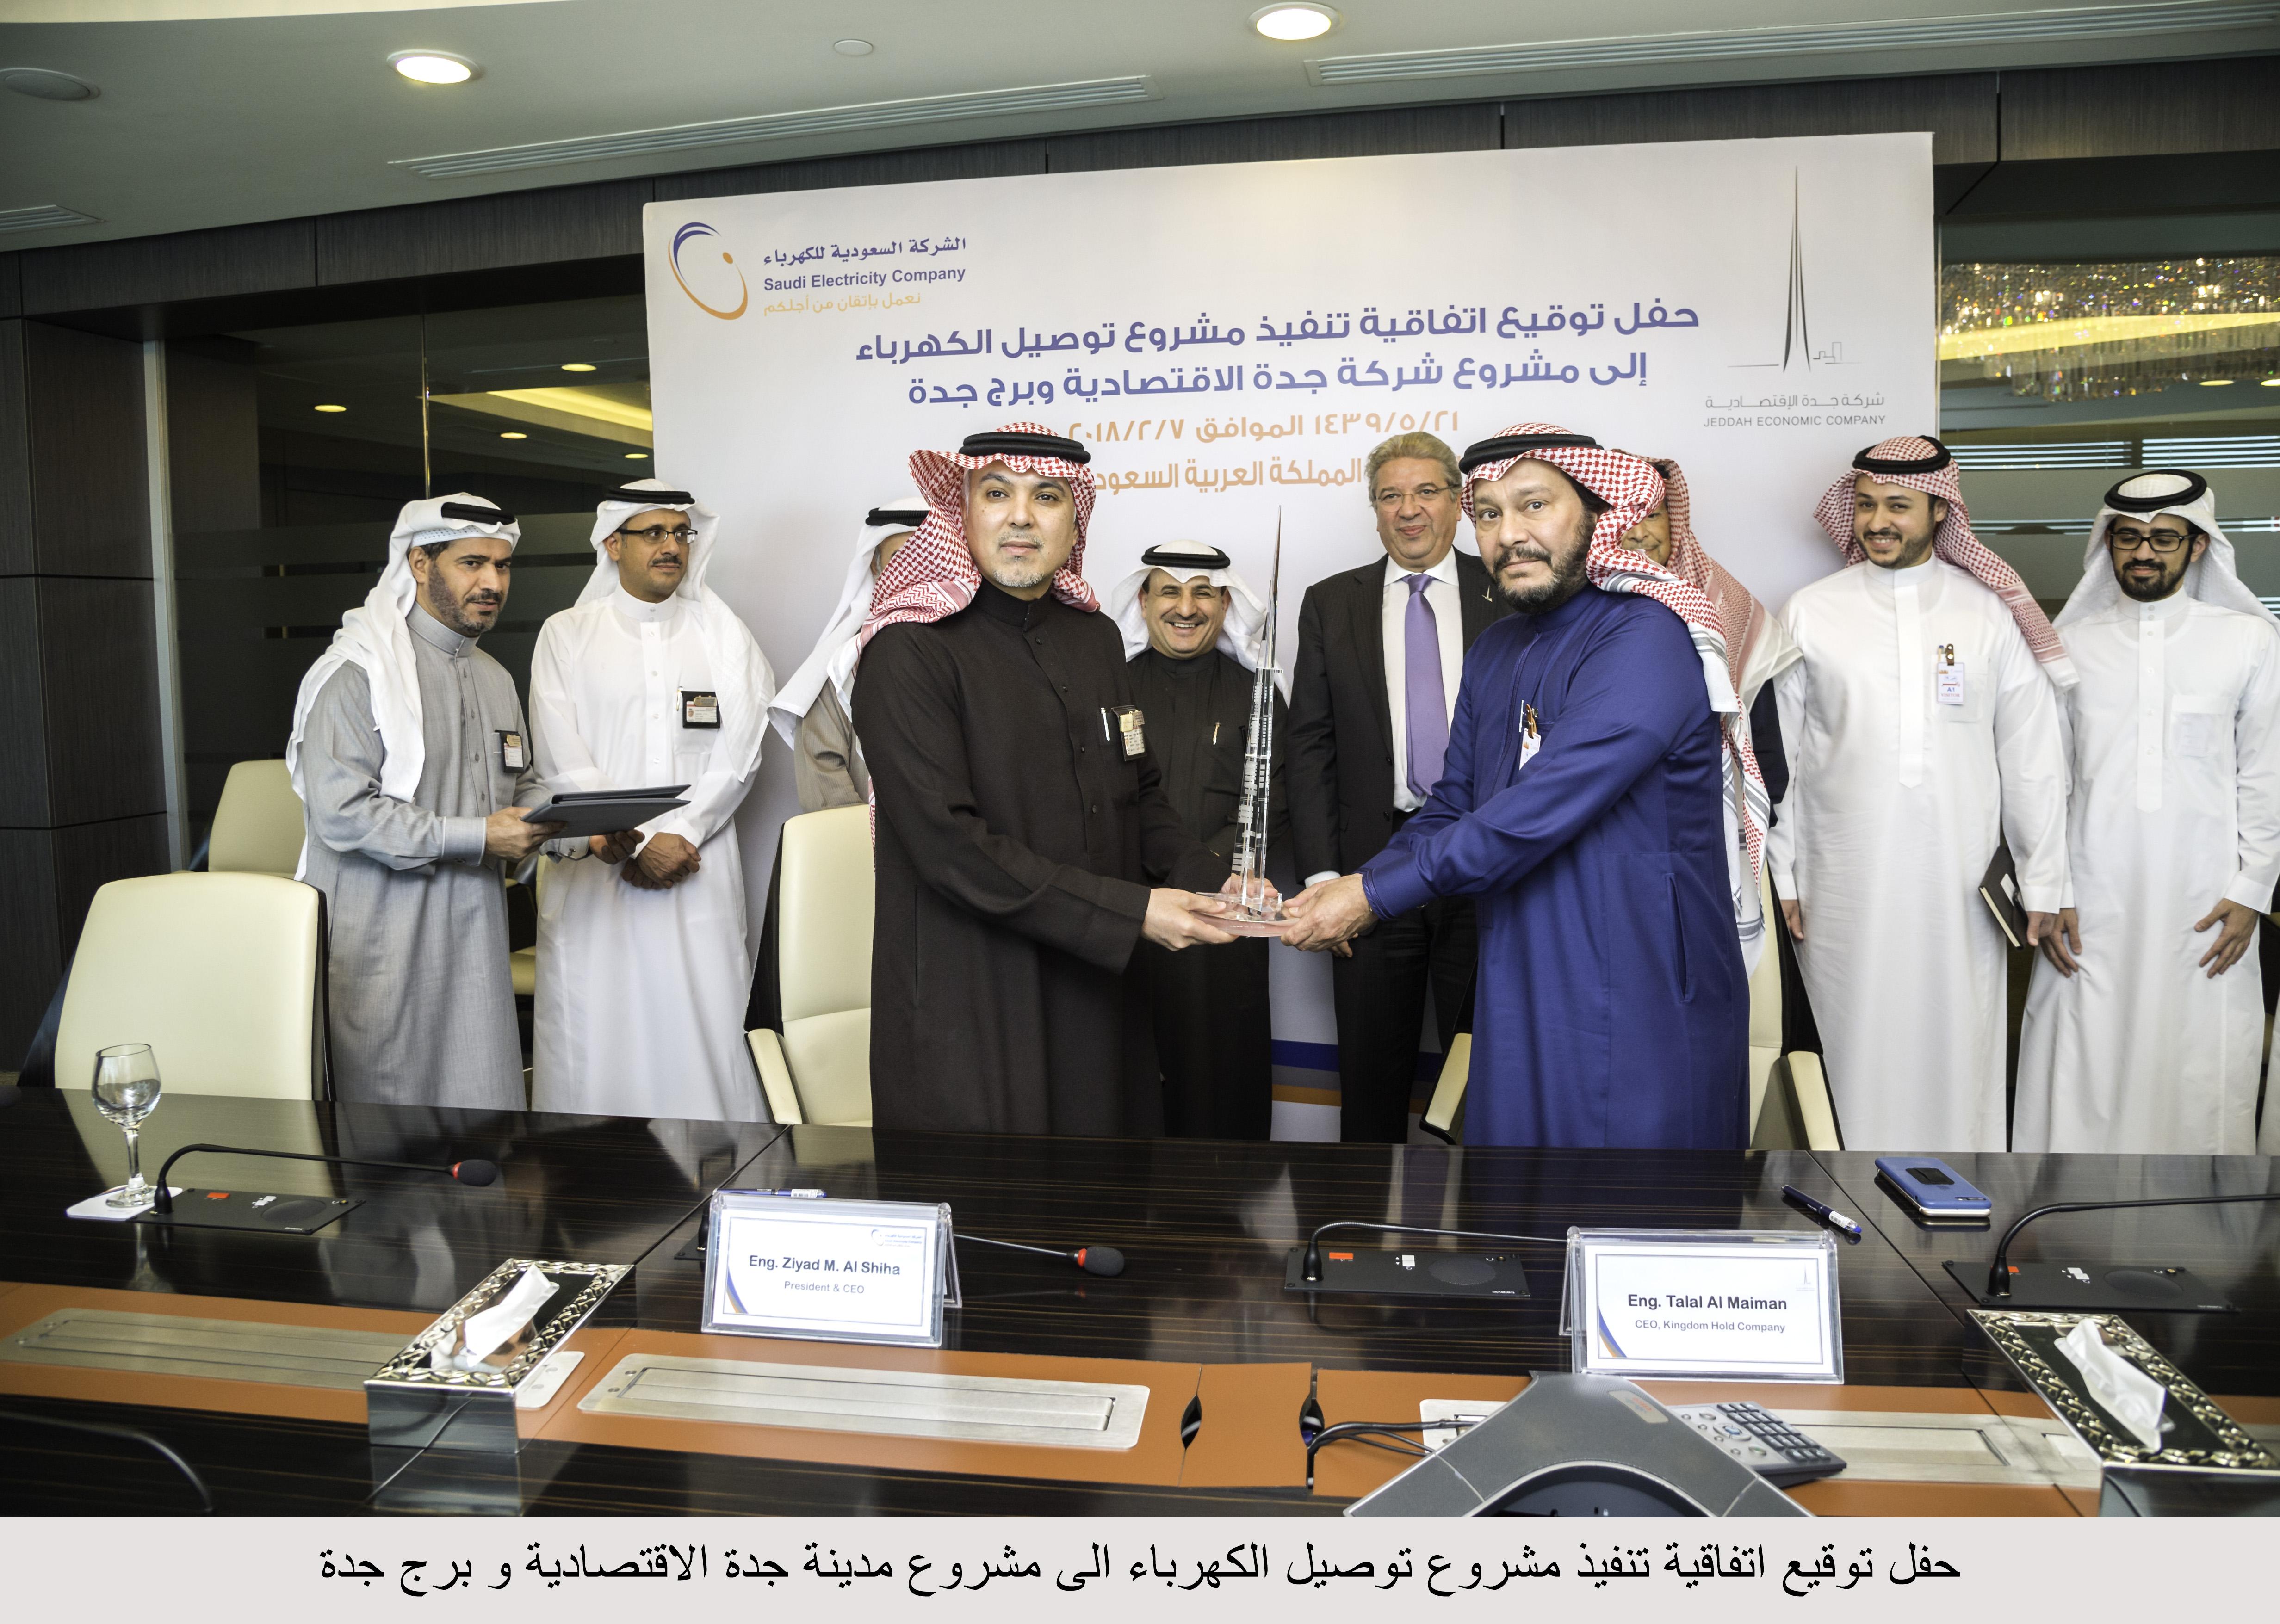 JEC & Saudi Electricity Company signing ceremony Photo 2